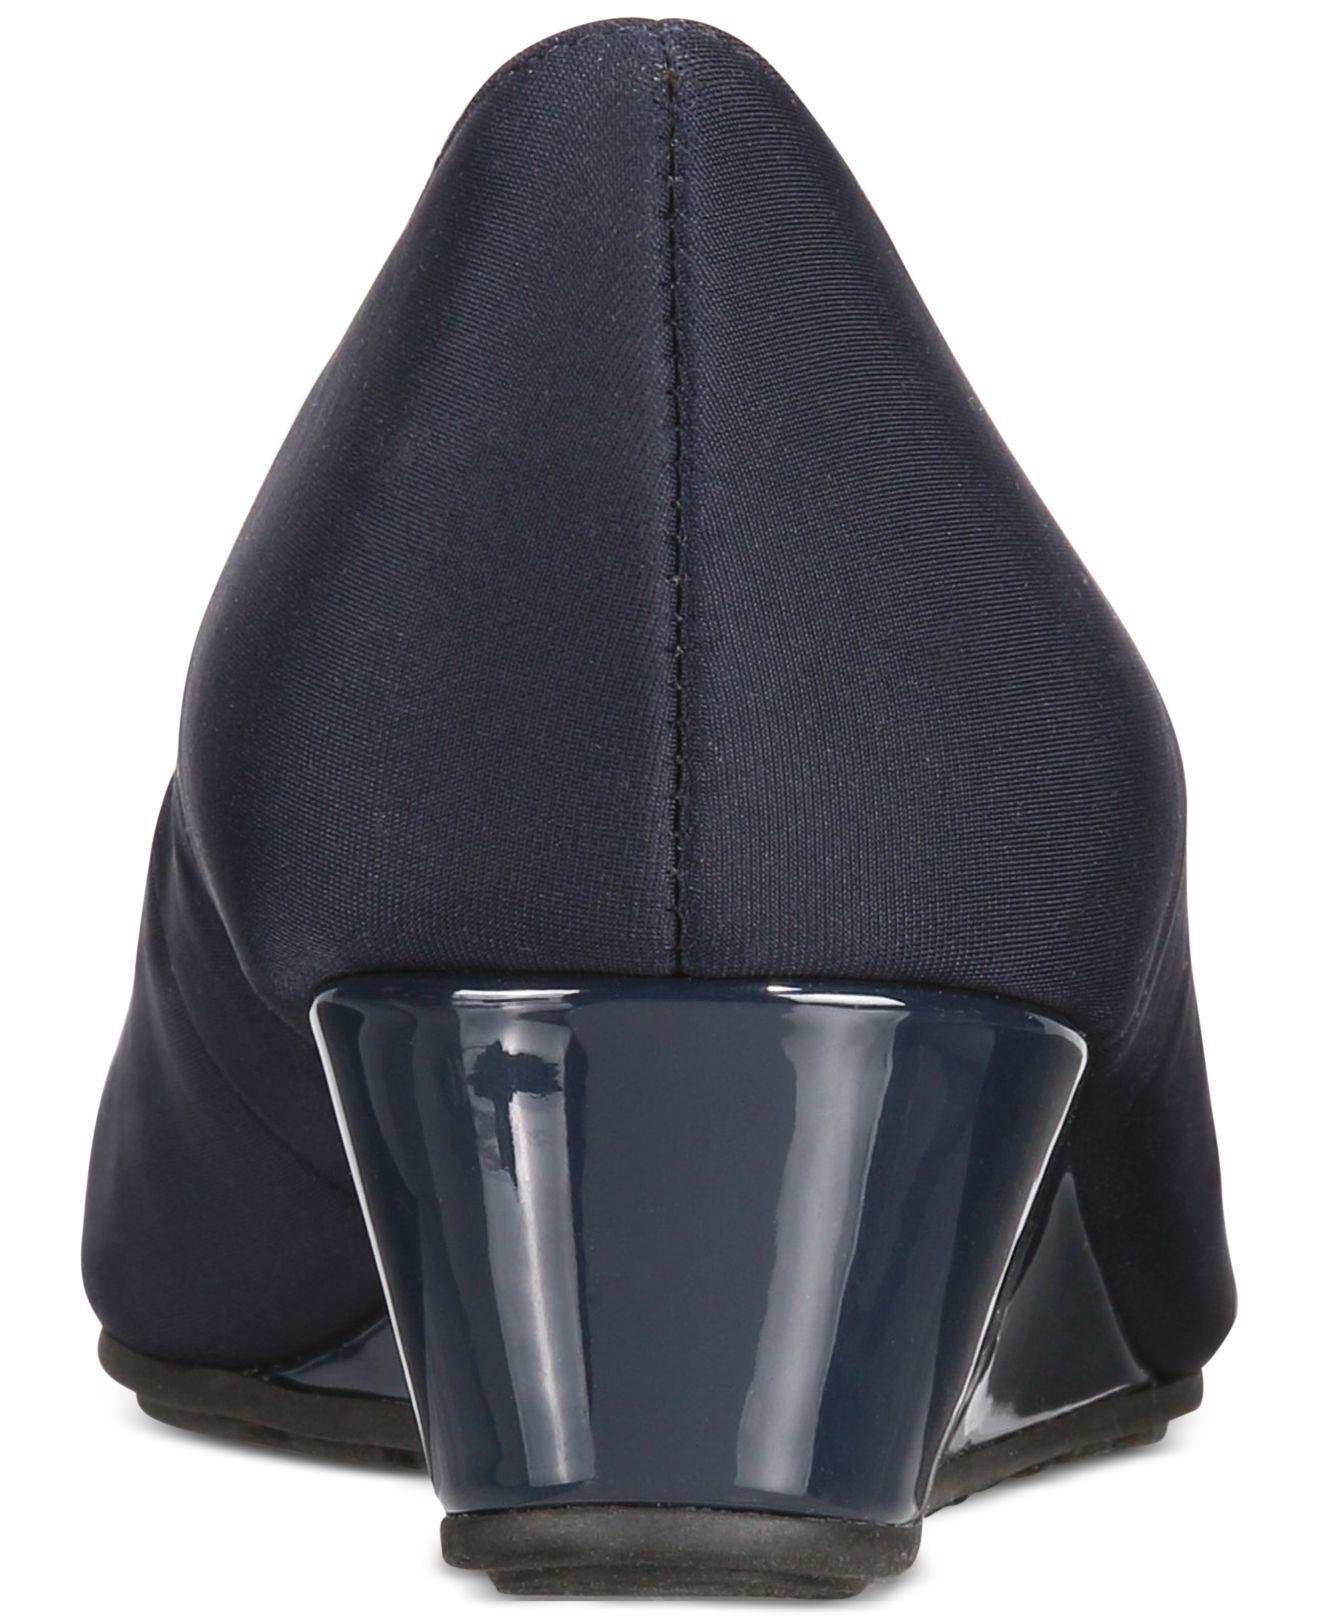 bee0906261cd Bandolino - Blue Candra Peep-toe Wedge Pumps - Lyst. View fullscreen